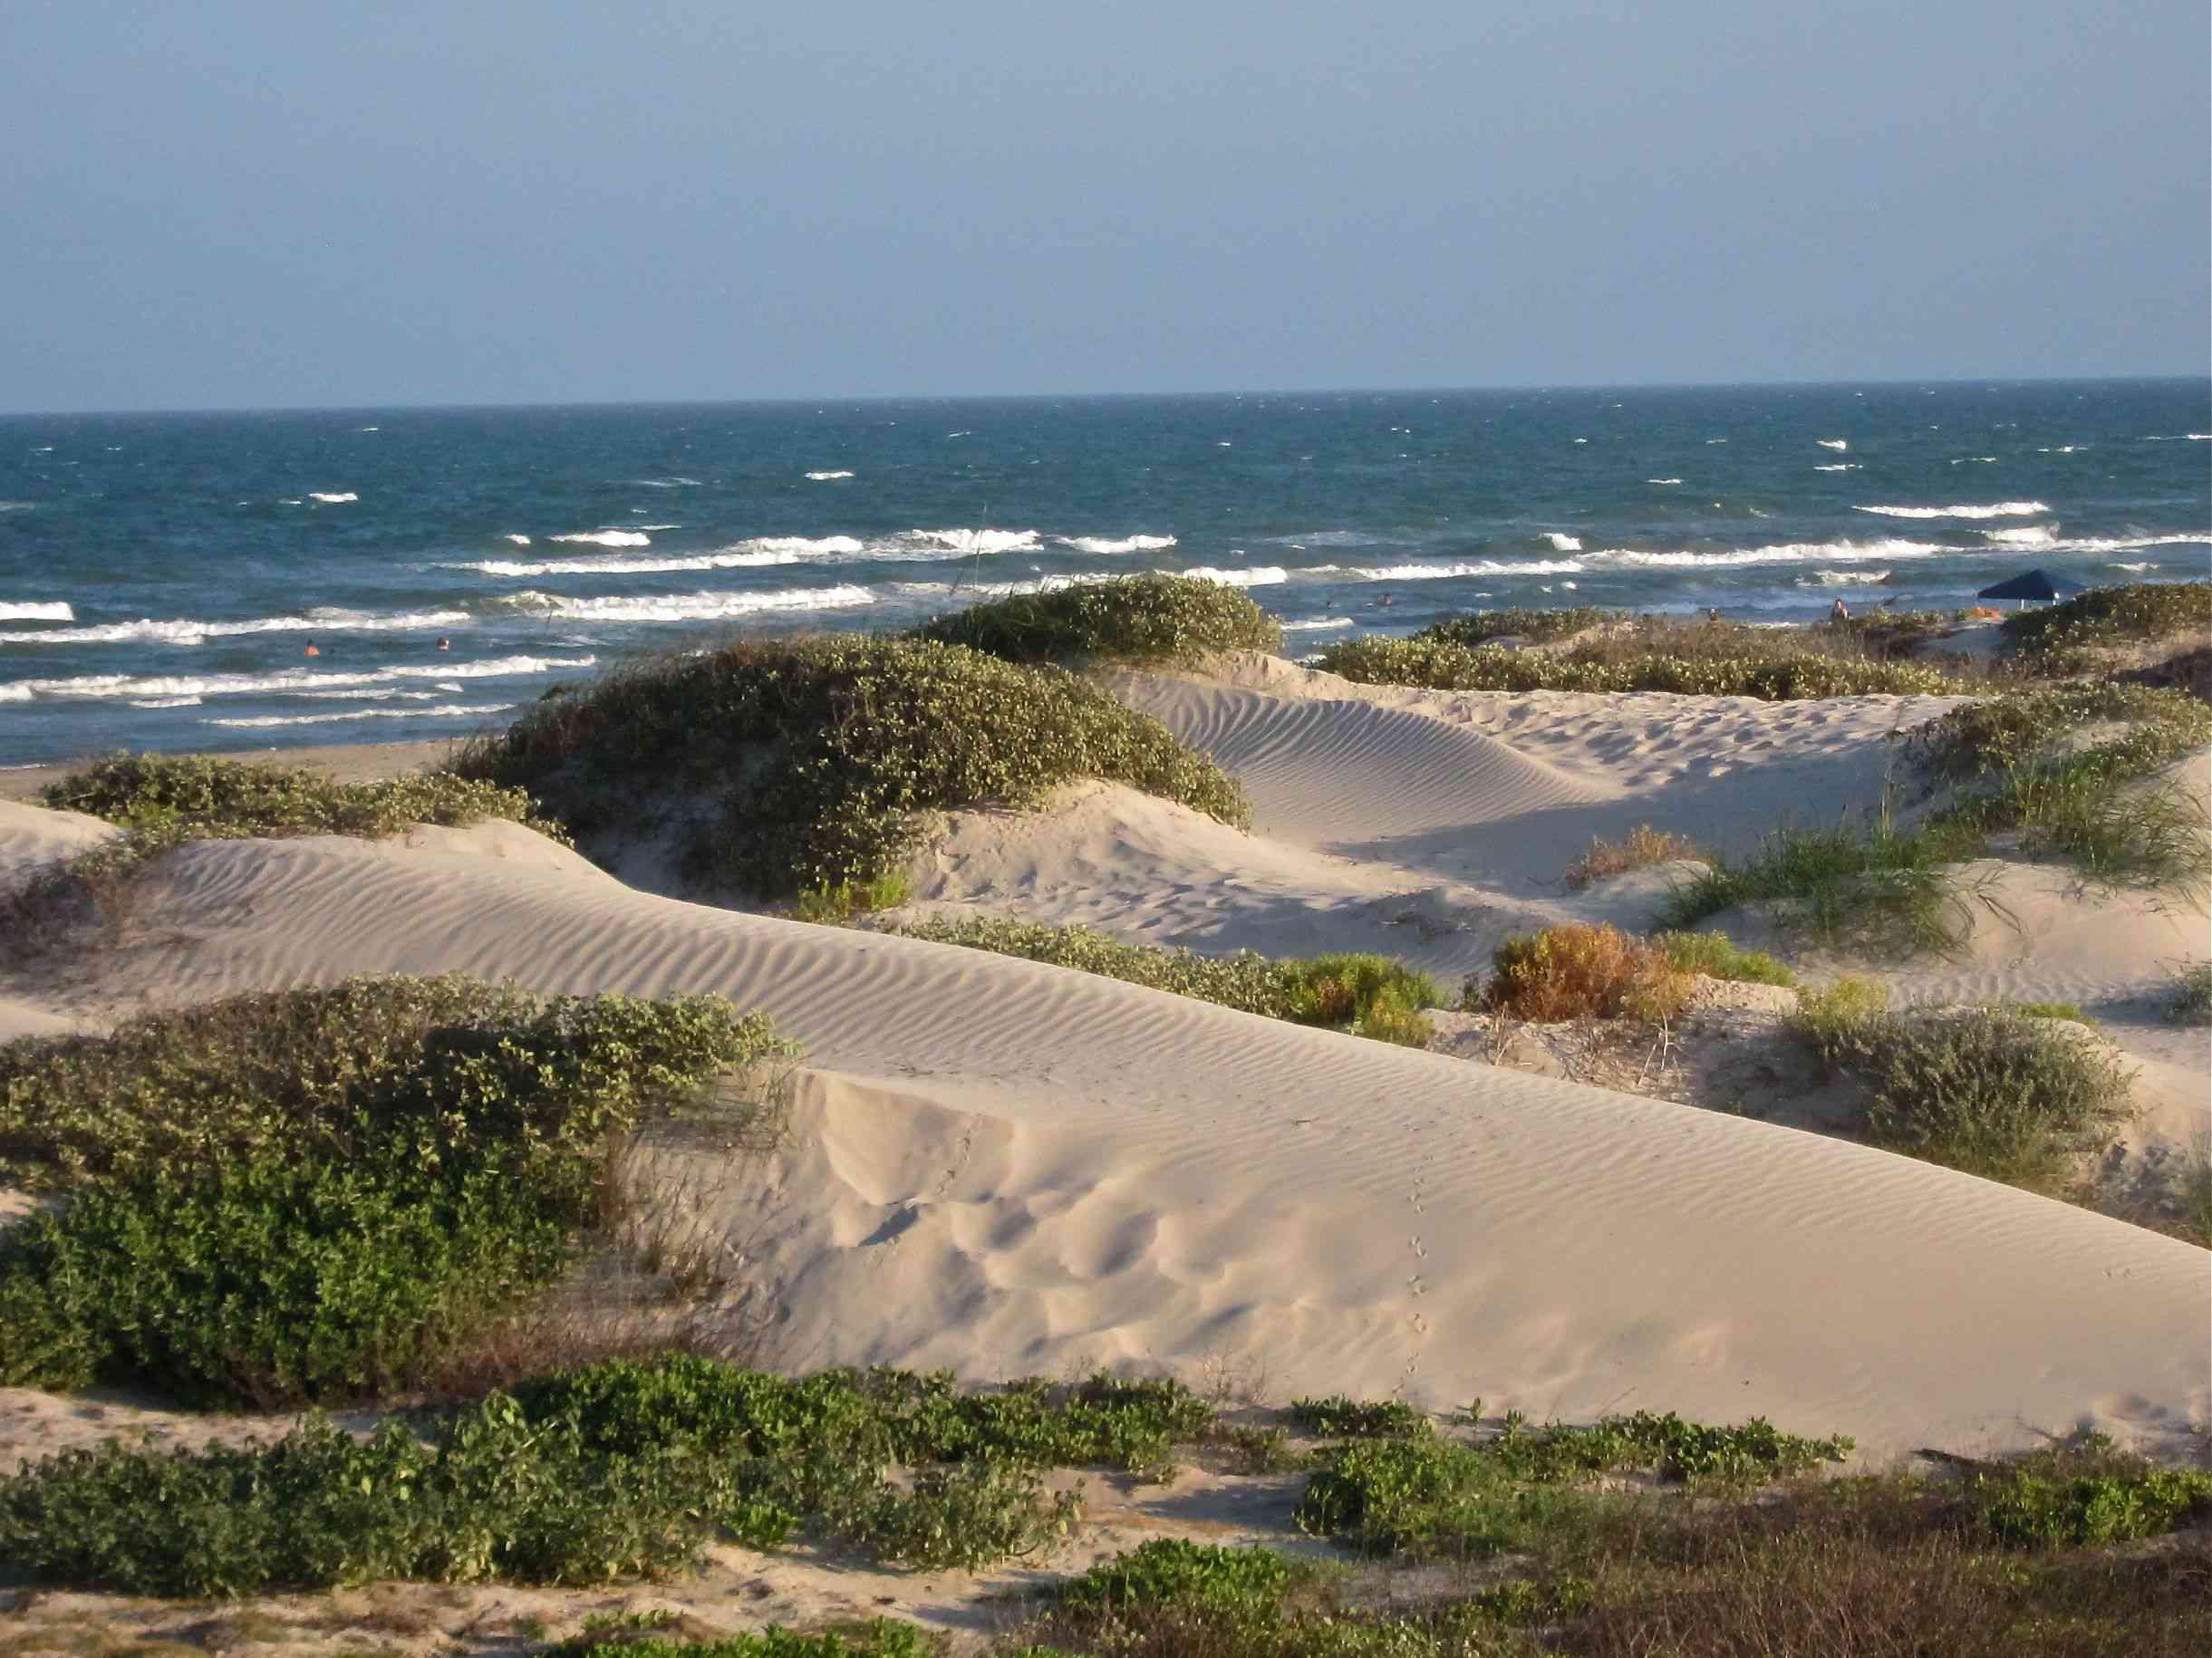 Sand dunes at Padre Island National Seashore